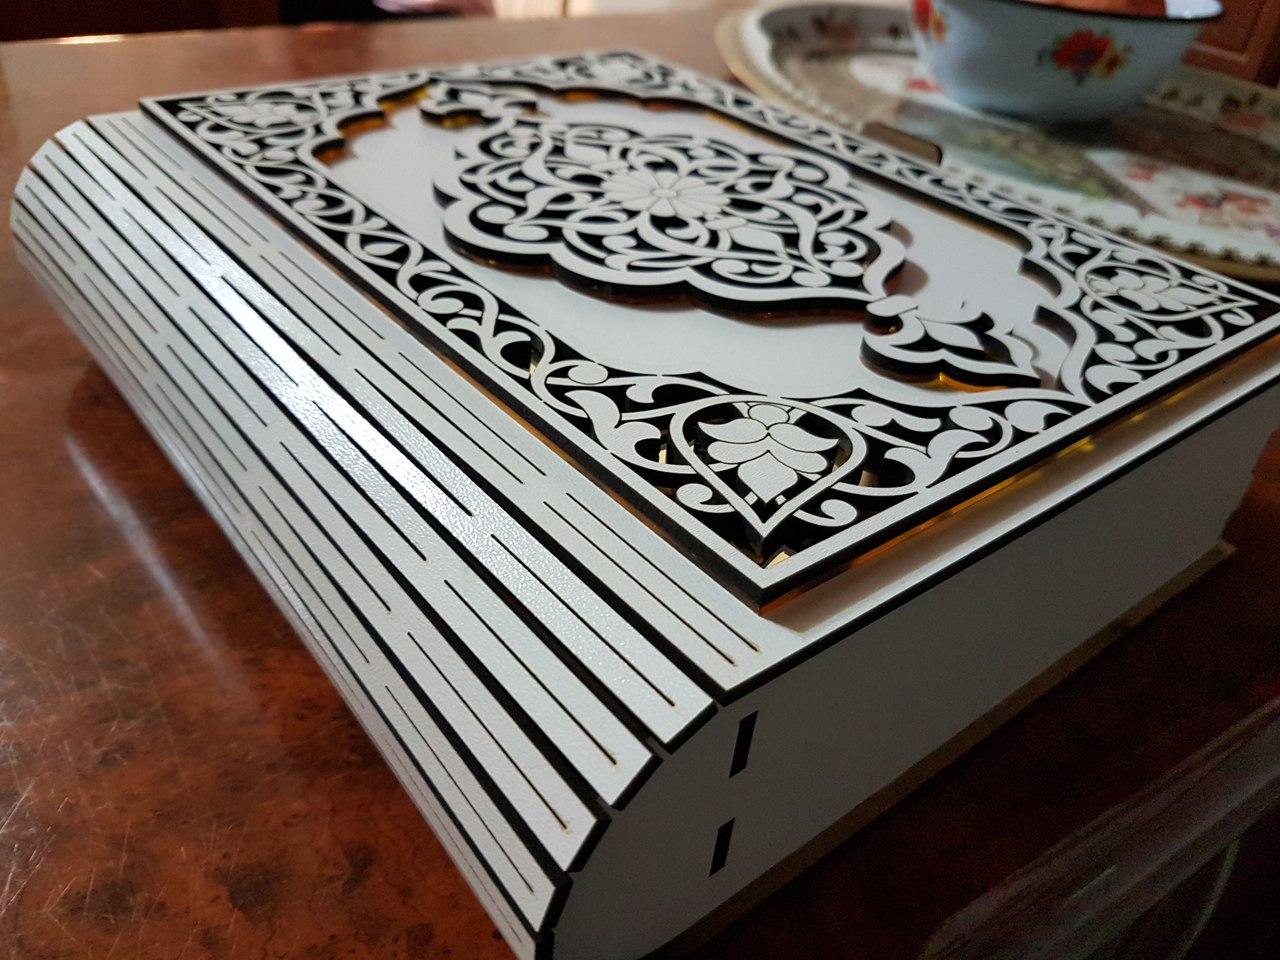 Beautiful Laser Cut Box Design Free CDR Vectors Art